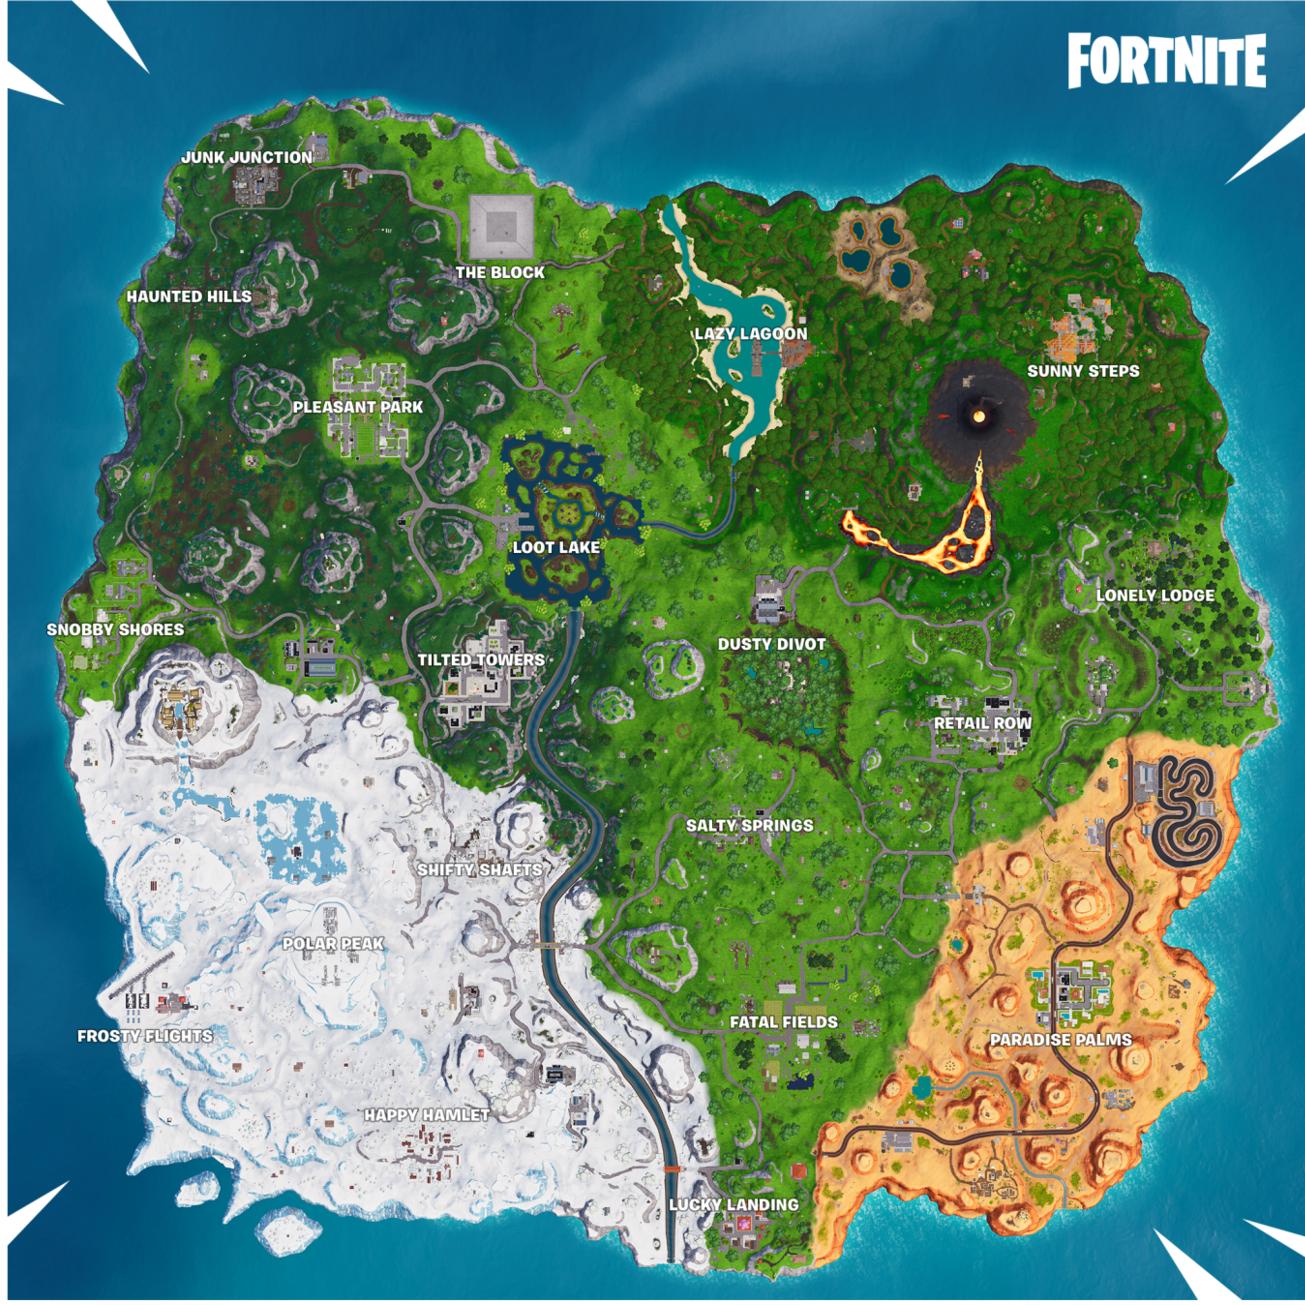 Fortnite Map Quiz | Fortnite Generator Account